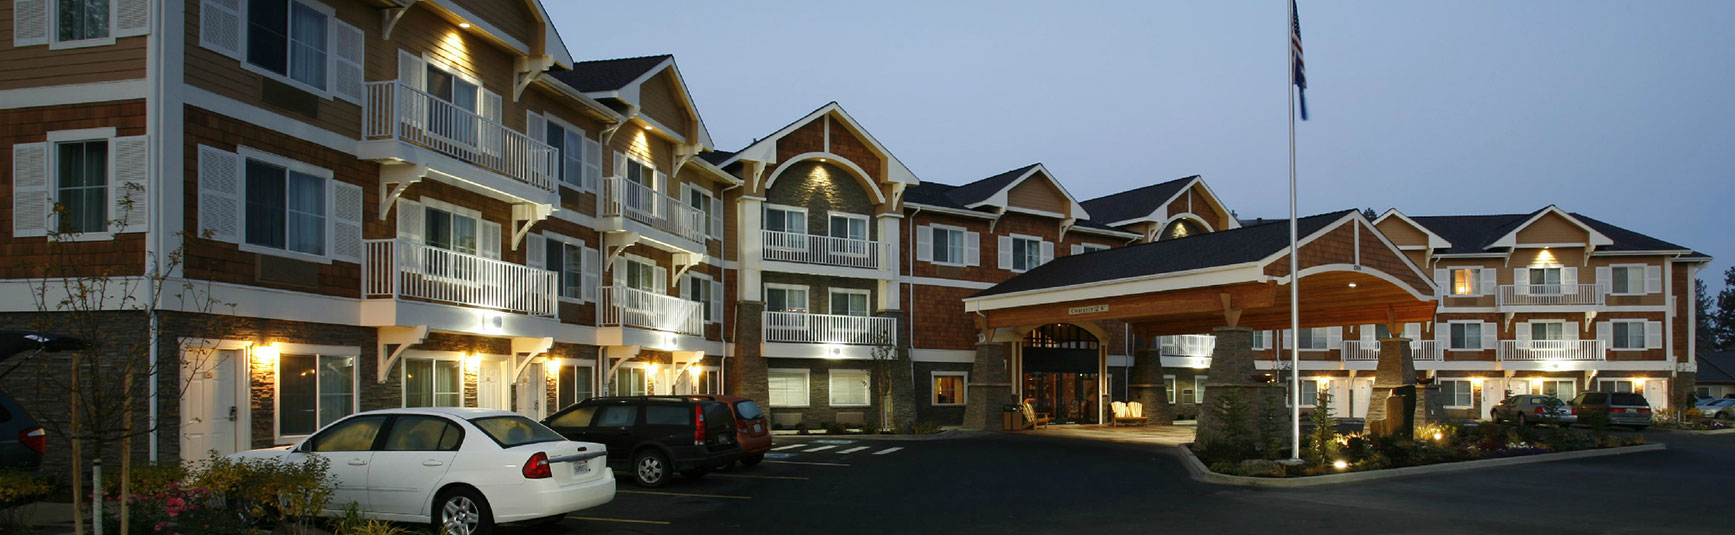 Holiday Inn Express – Coeur d'Alene